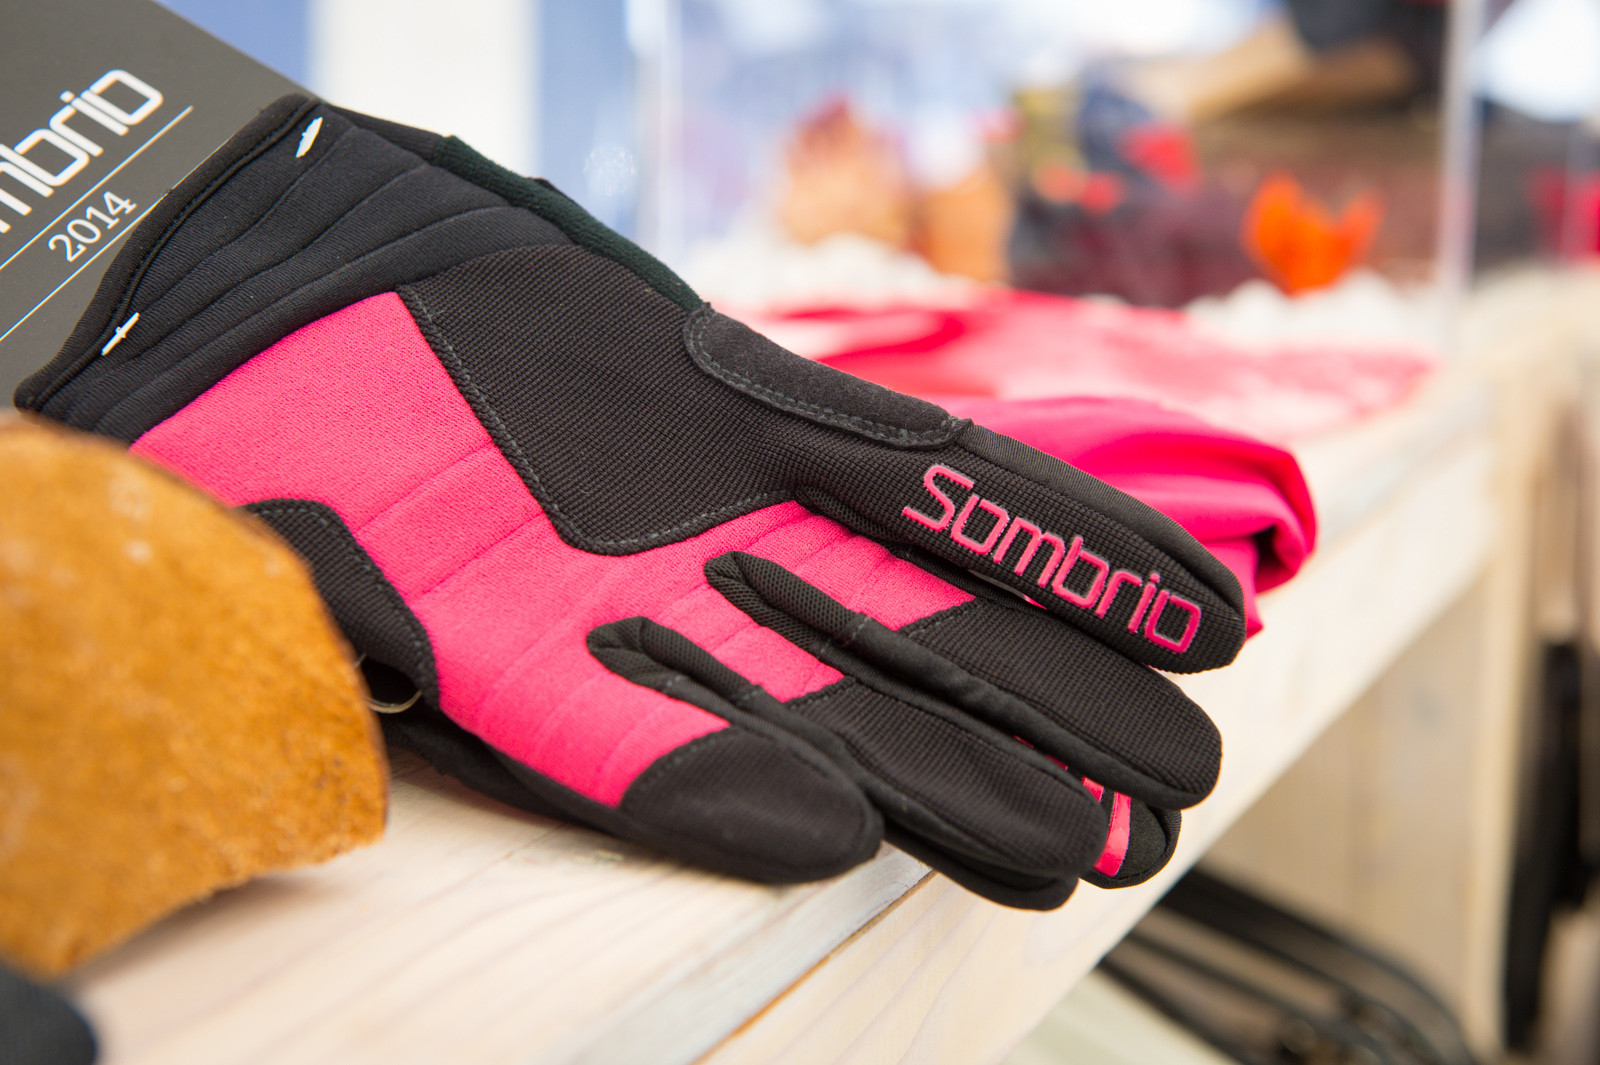 2014 Sombrio Women's Ruckus Glove - 2014 Mountain Bike Apparel & Protection at Eurobike 2013 - Mountain Biking Pictures - Vital MTB